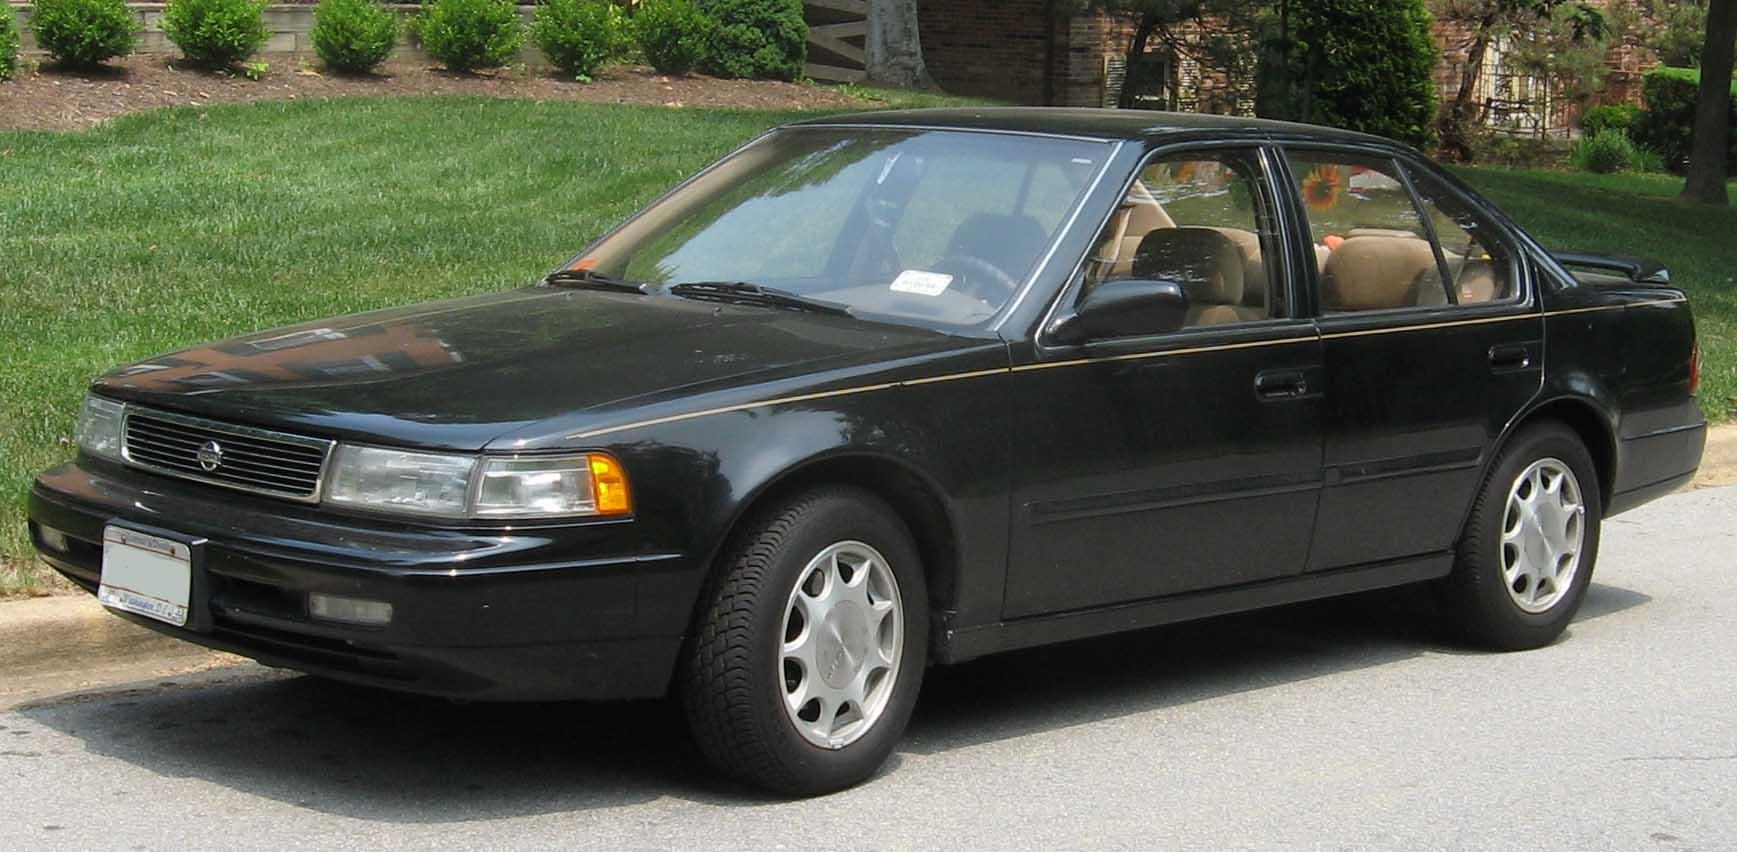 File:92-94 Nissan Maxima.jpg - Wikimedia Commons